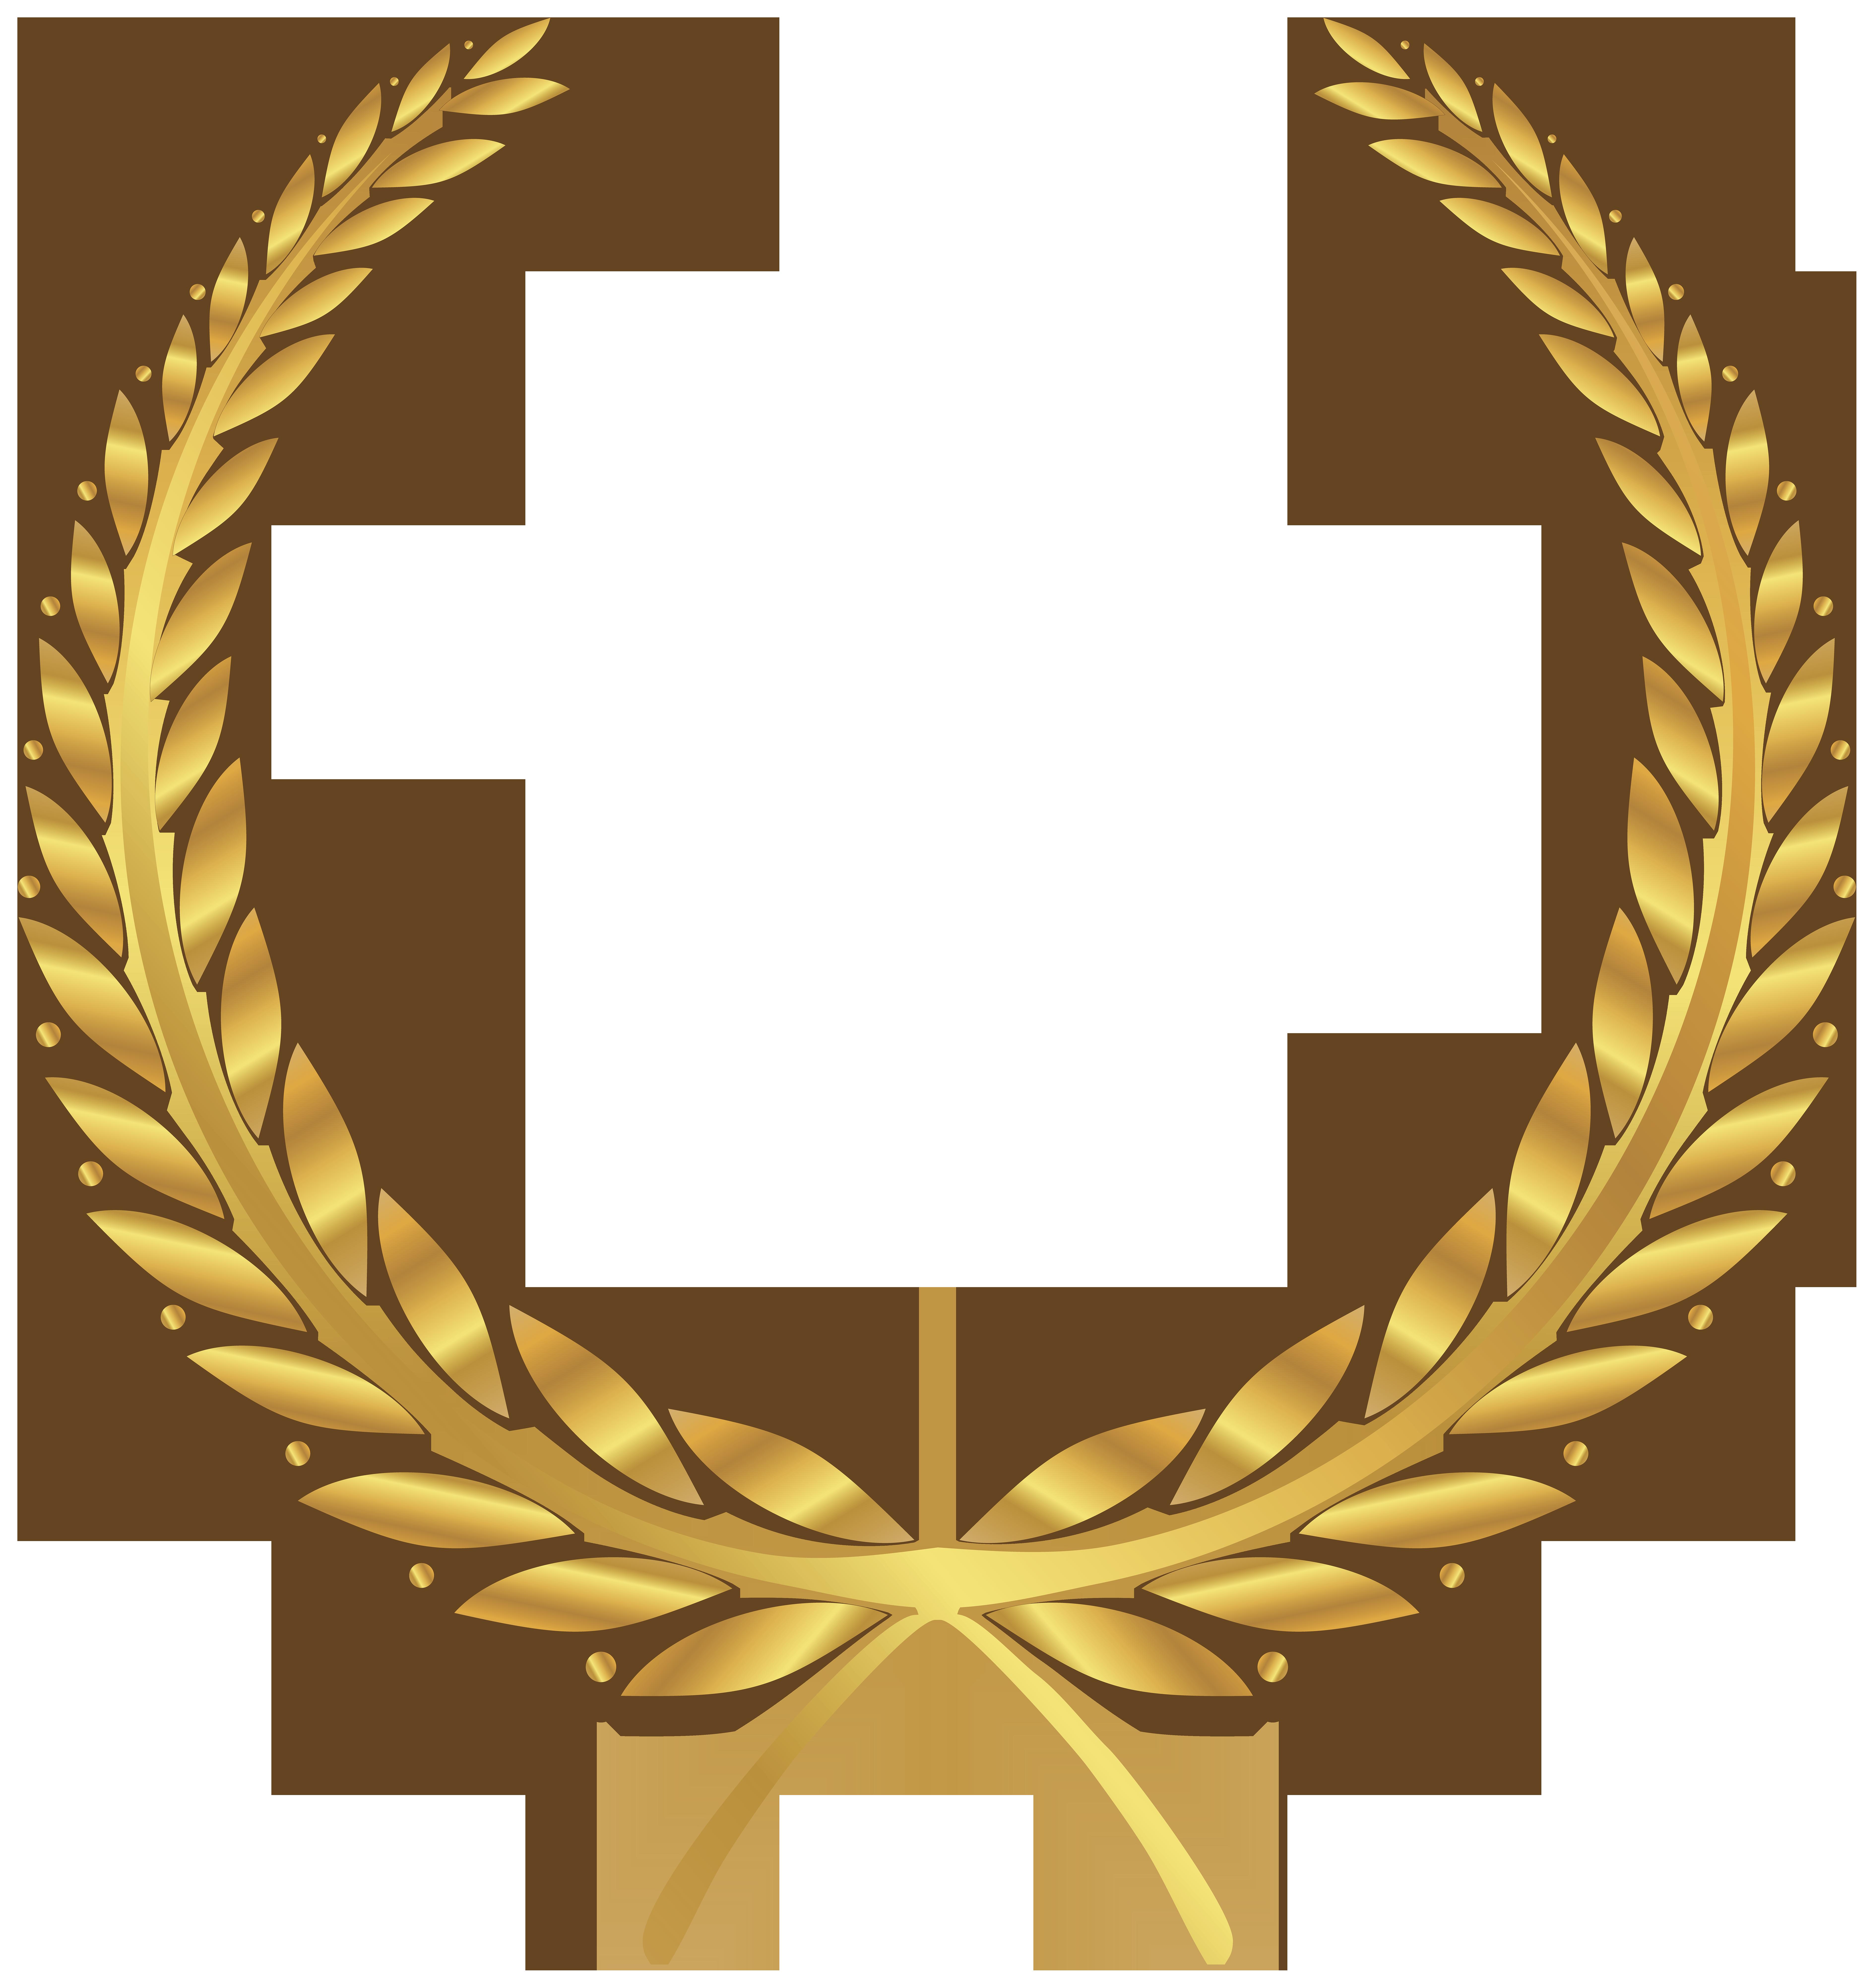 Golden Wreath PNG Clip Art Image.